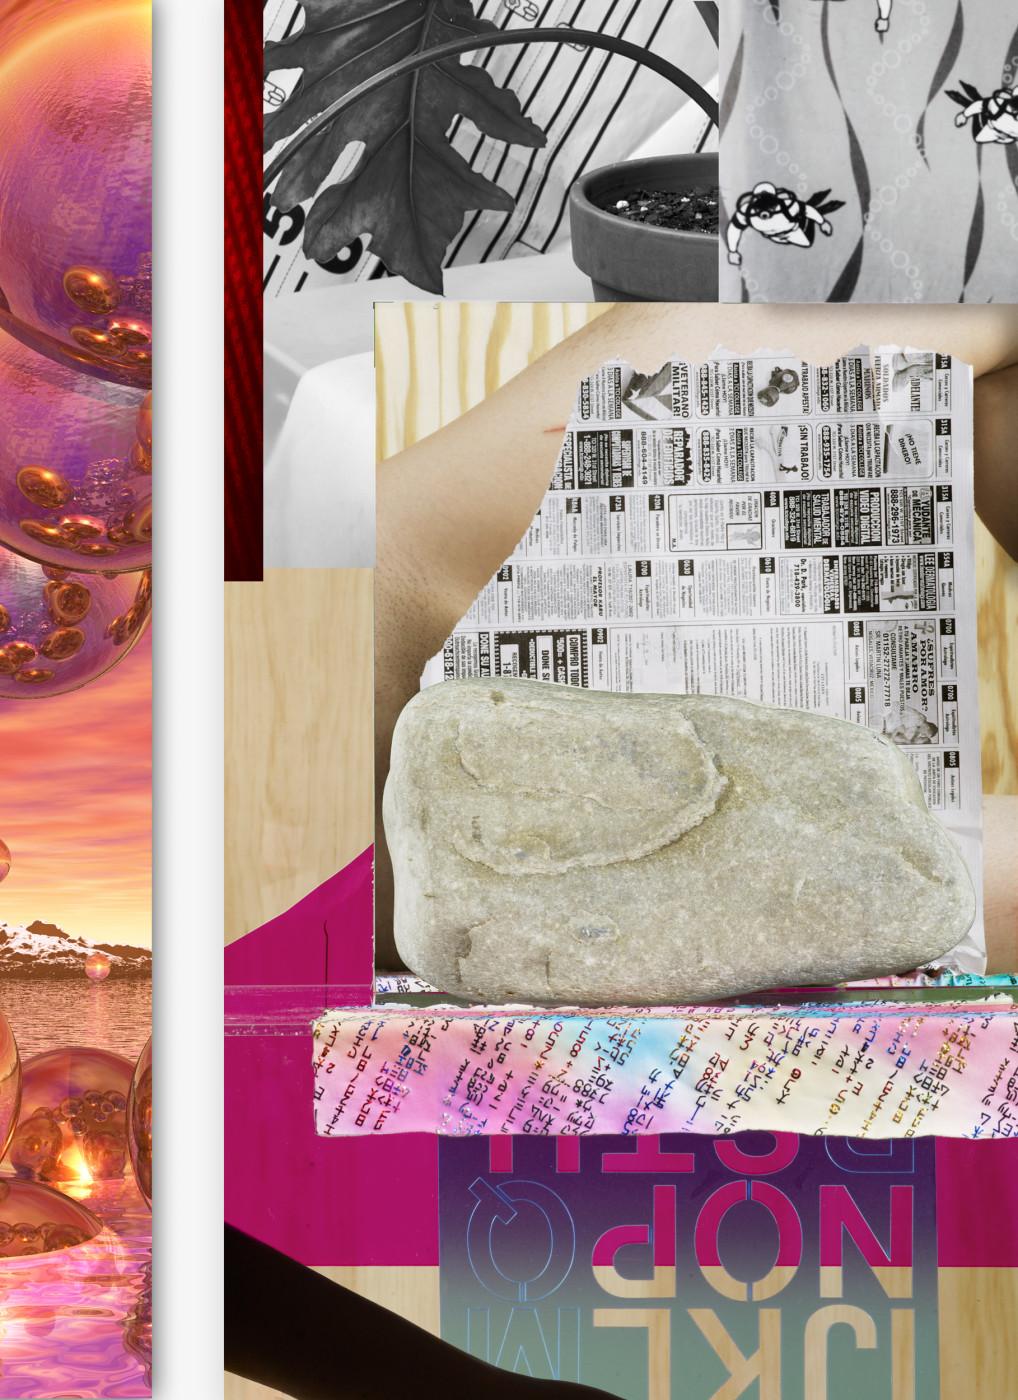 "<div class=""title""><em>#4</em>, 2012</div><div class=""medium"">archival pigment print</div><div class=""dimensions"">97.0 x 71.0 x 3.5 cm<br />38 3/16 x 27 15/16 x 1 3/8 in.</div>"